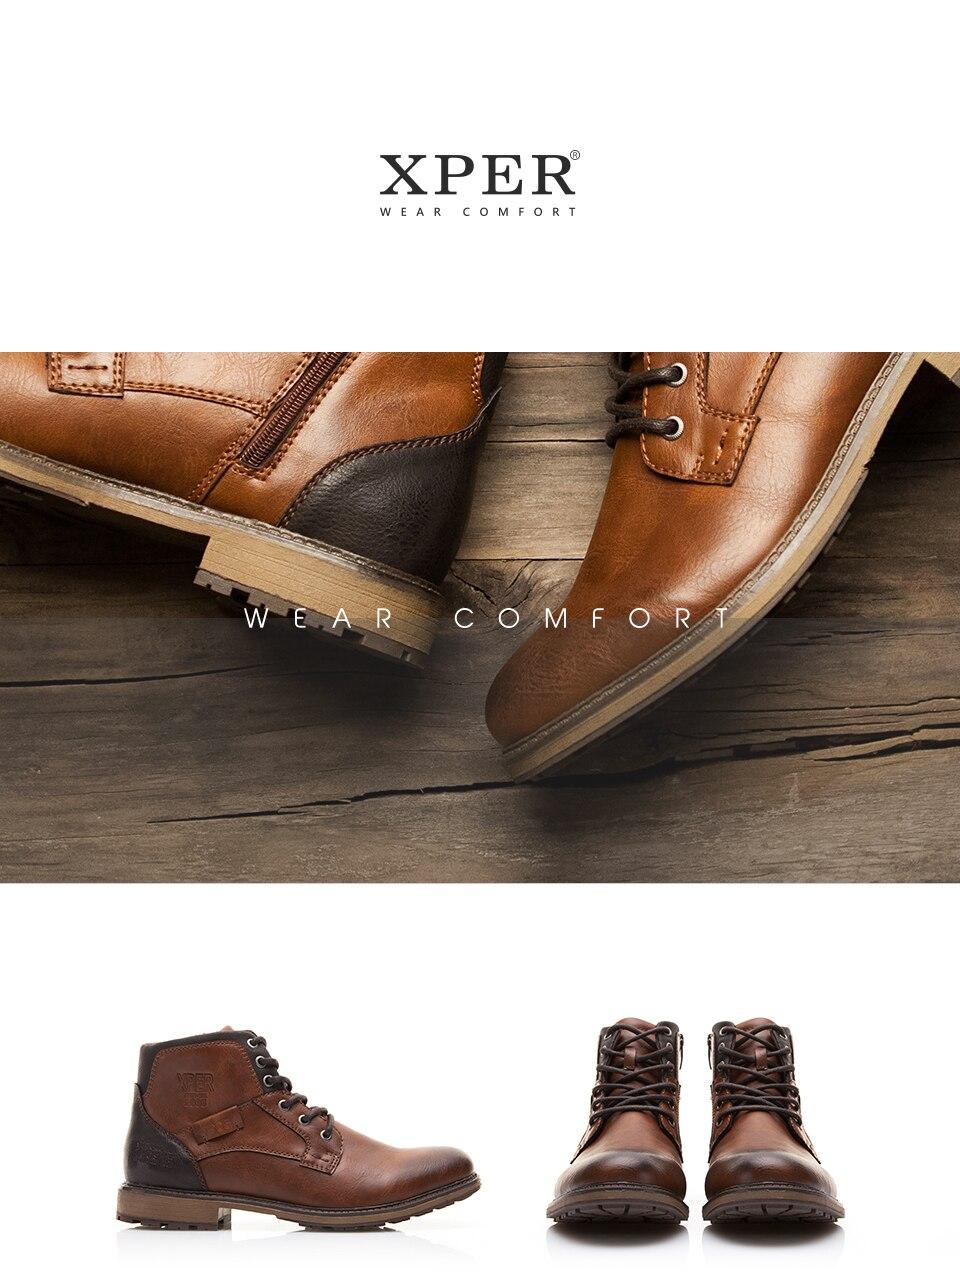 XPER Autumn Winter Boots